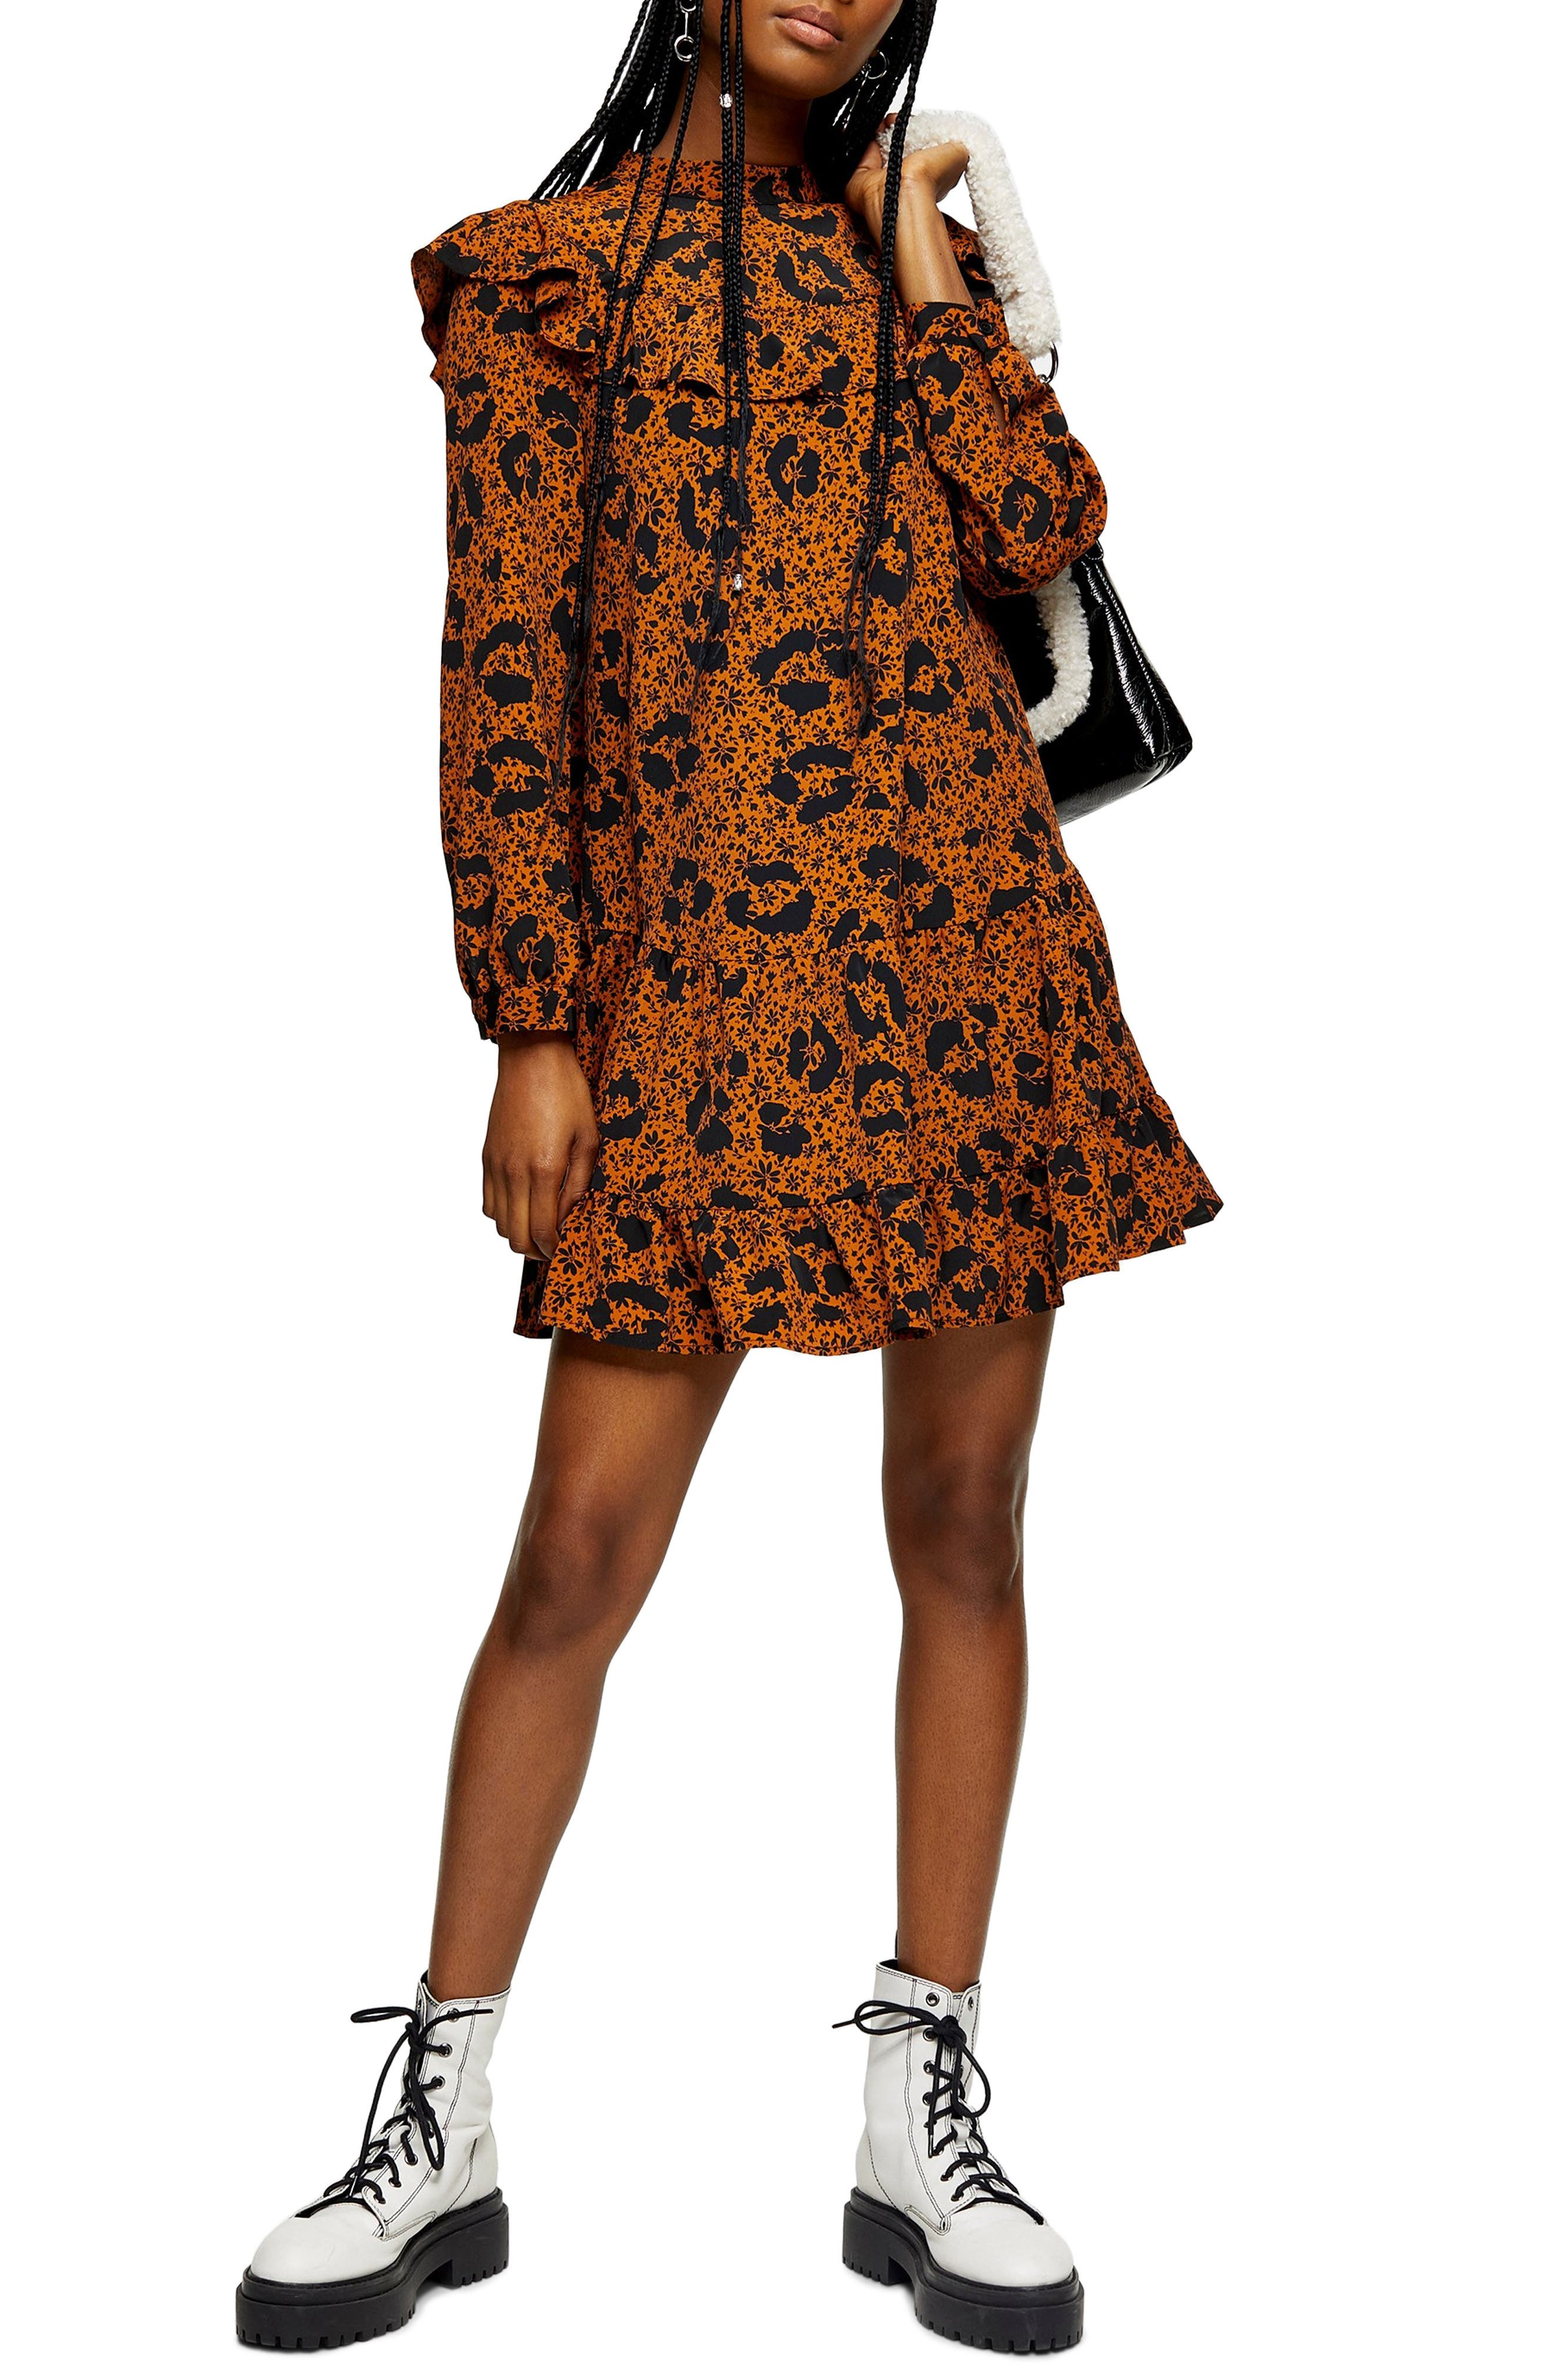 Topshop Leopard Print Frill Trousers Size UK 10  EU 38 US 6